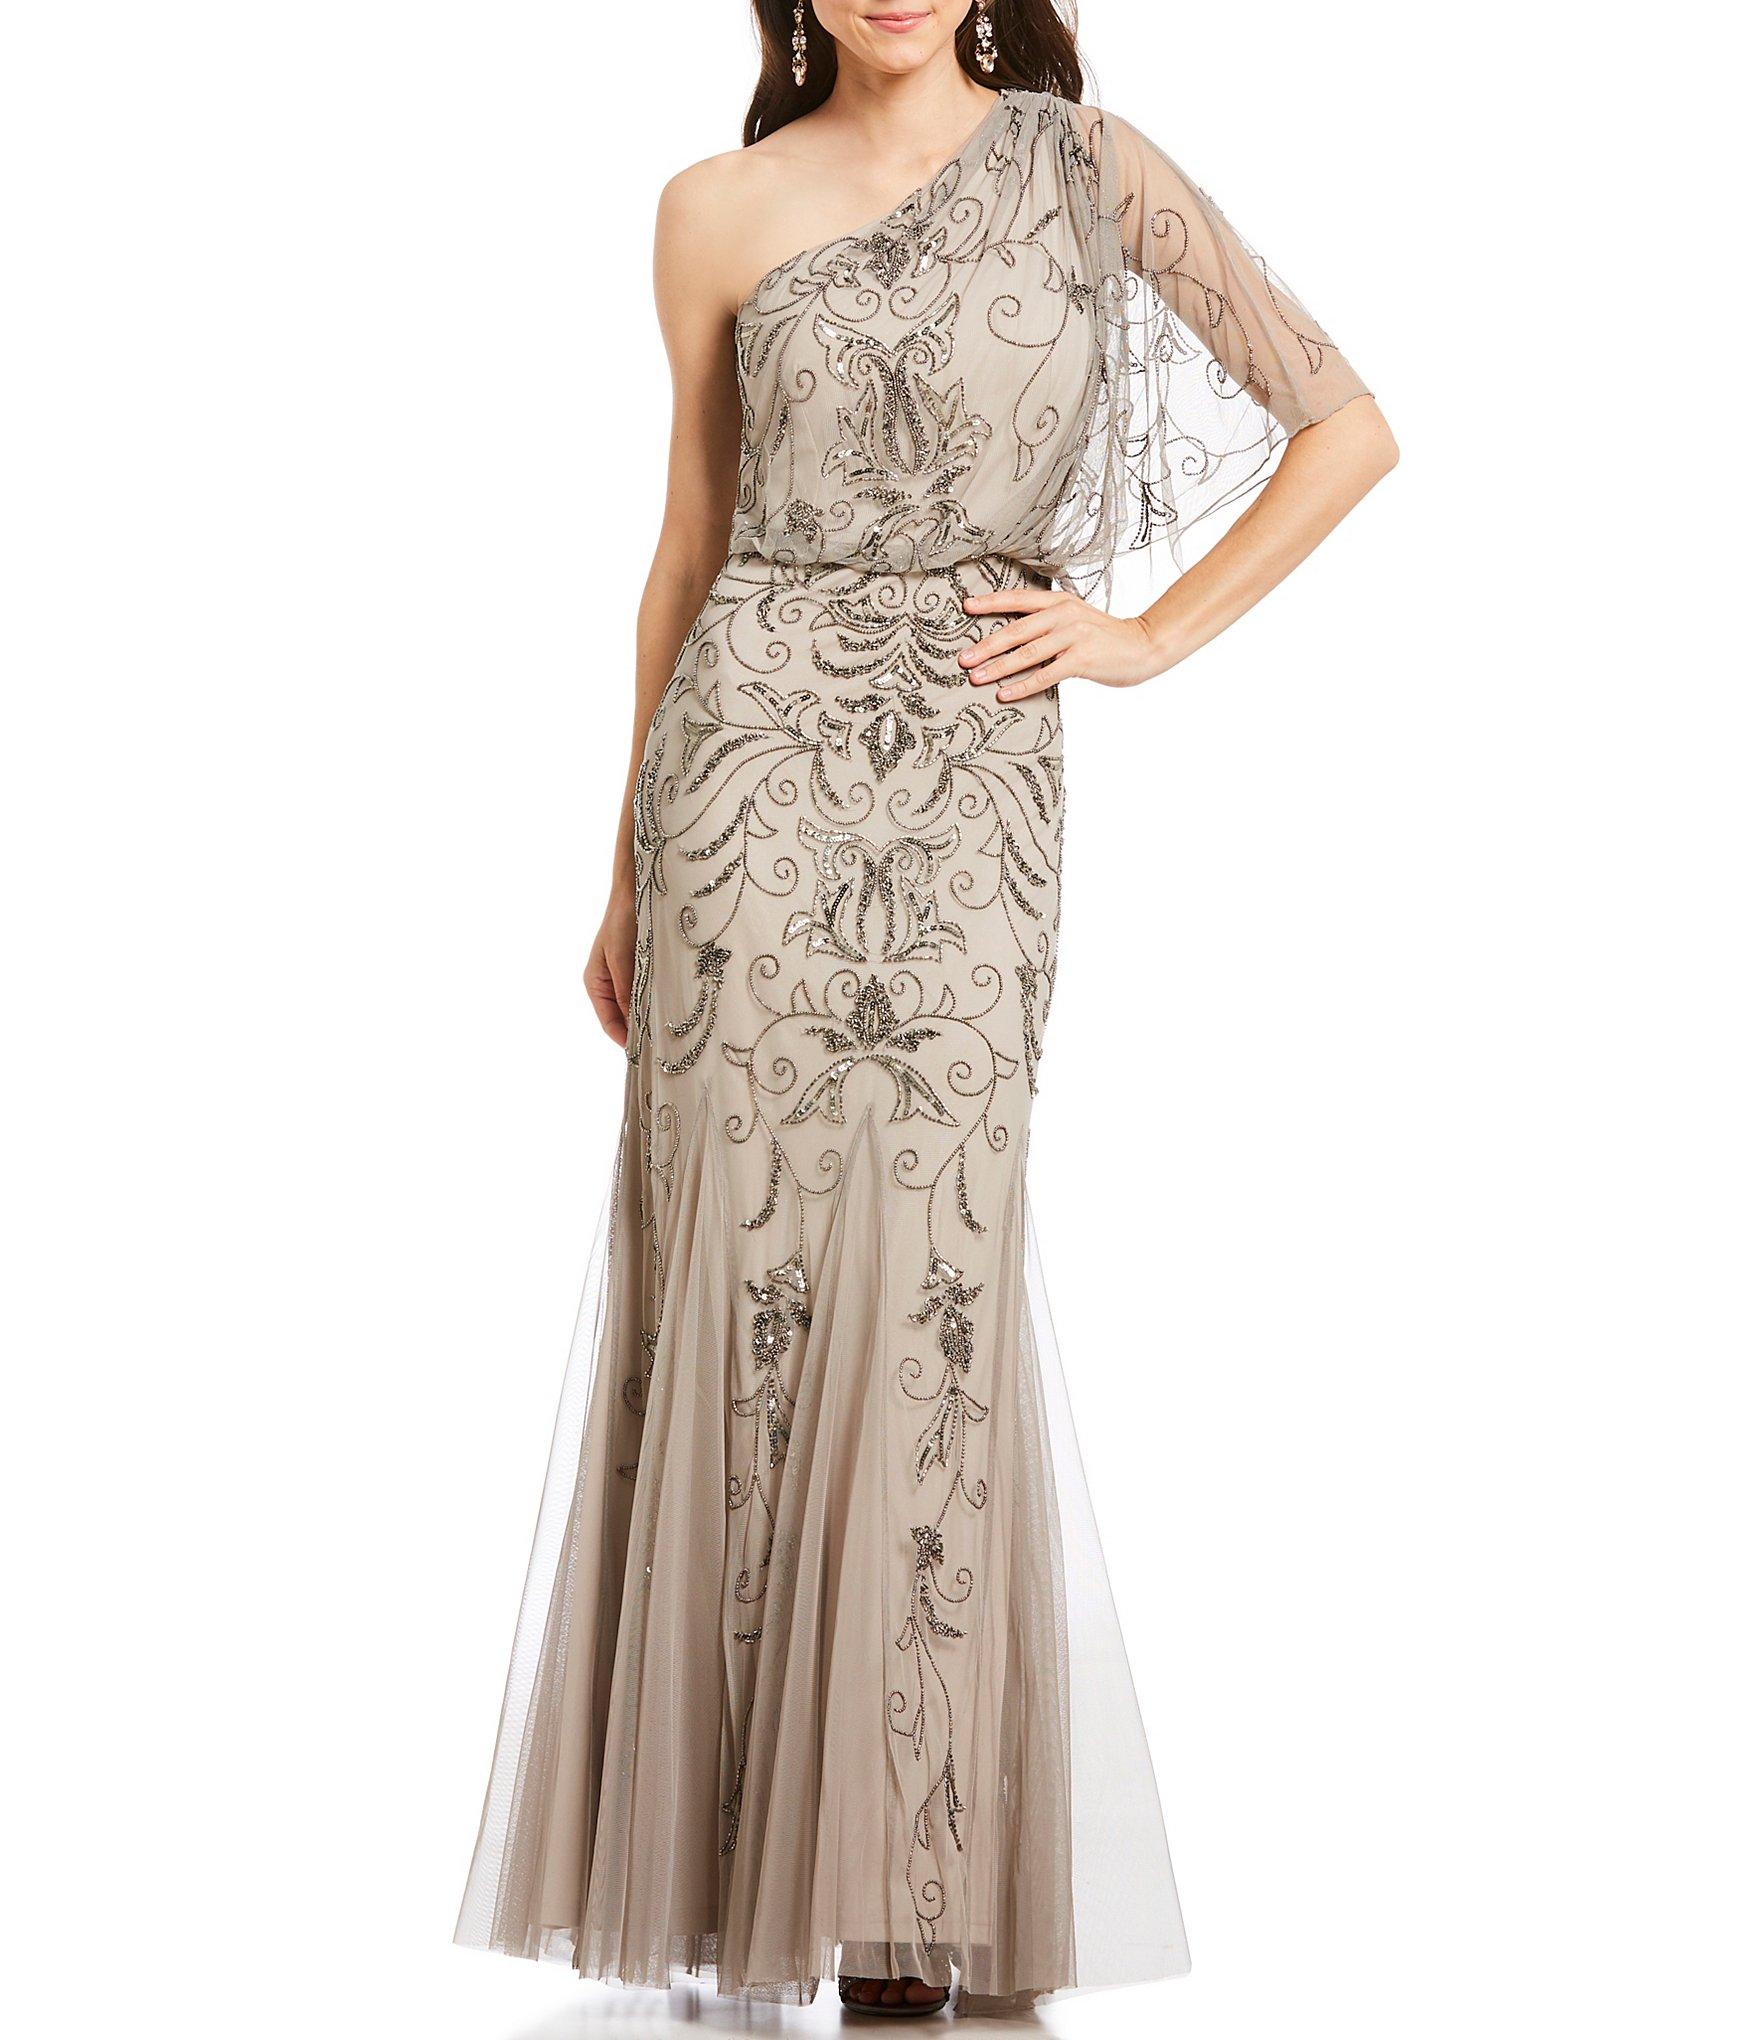 Long wedding dresses gowns dillards ombrellifo Gallery